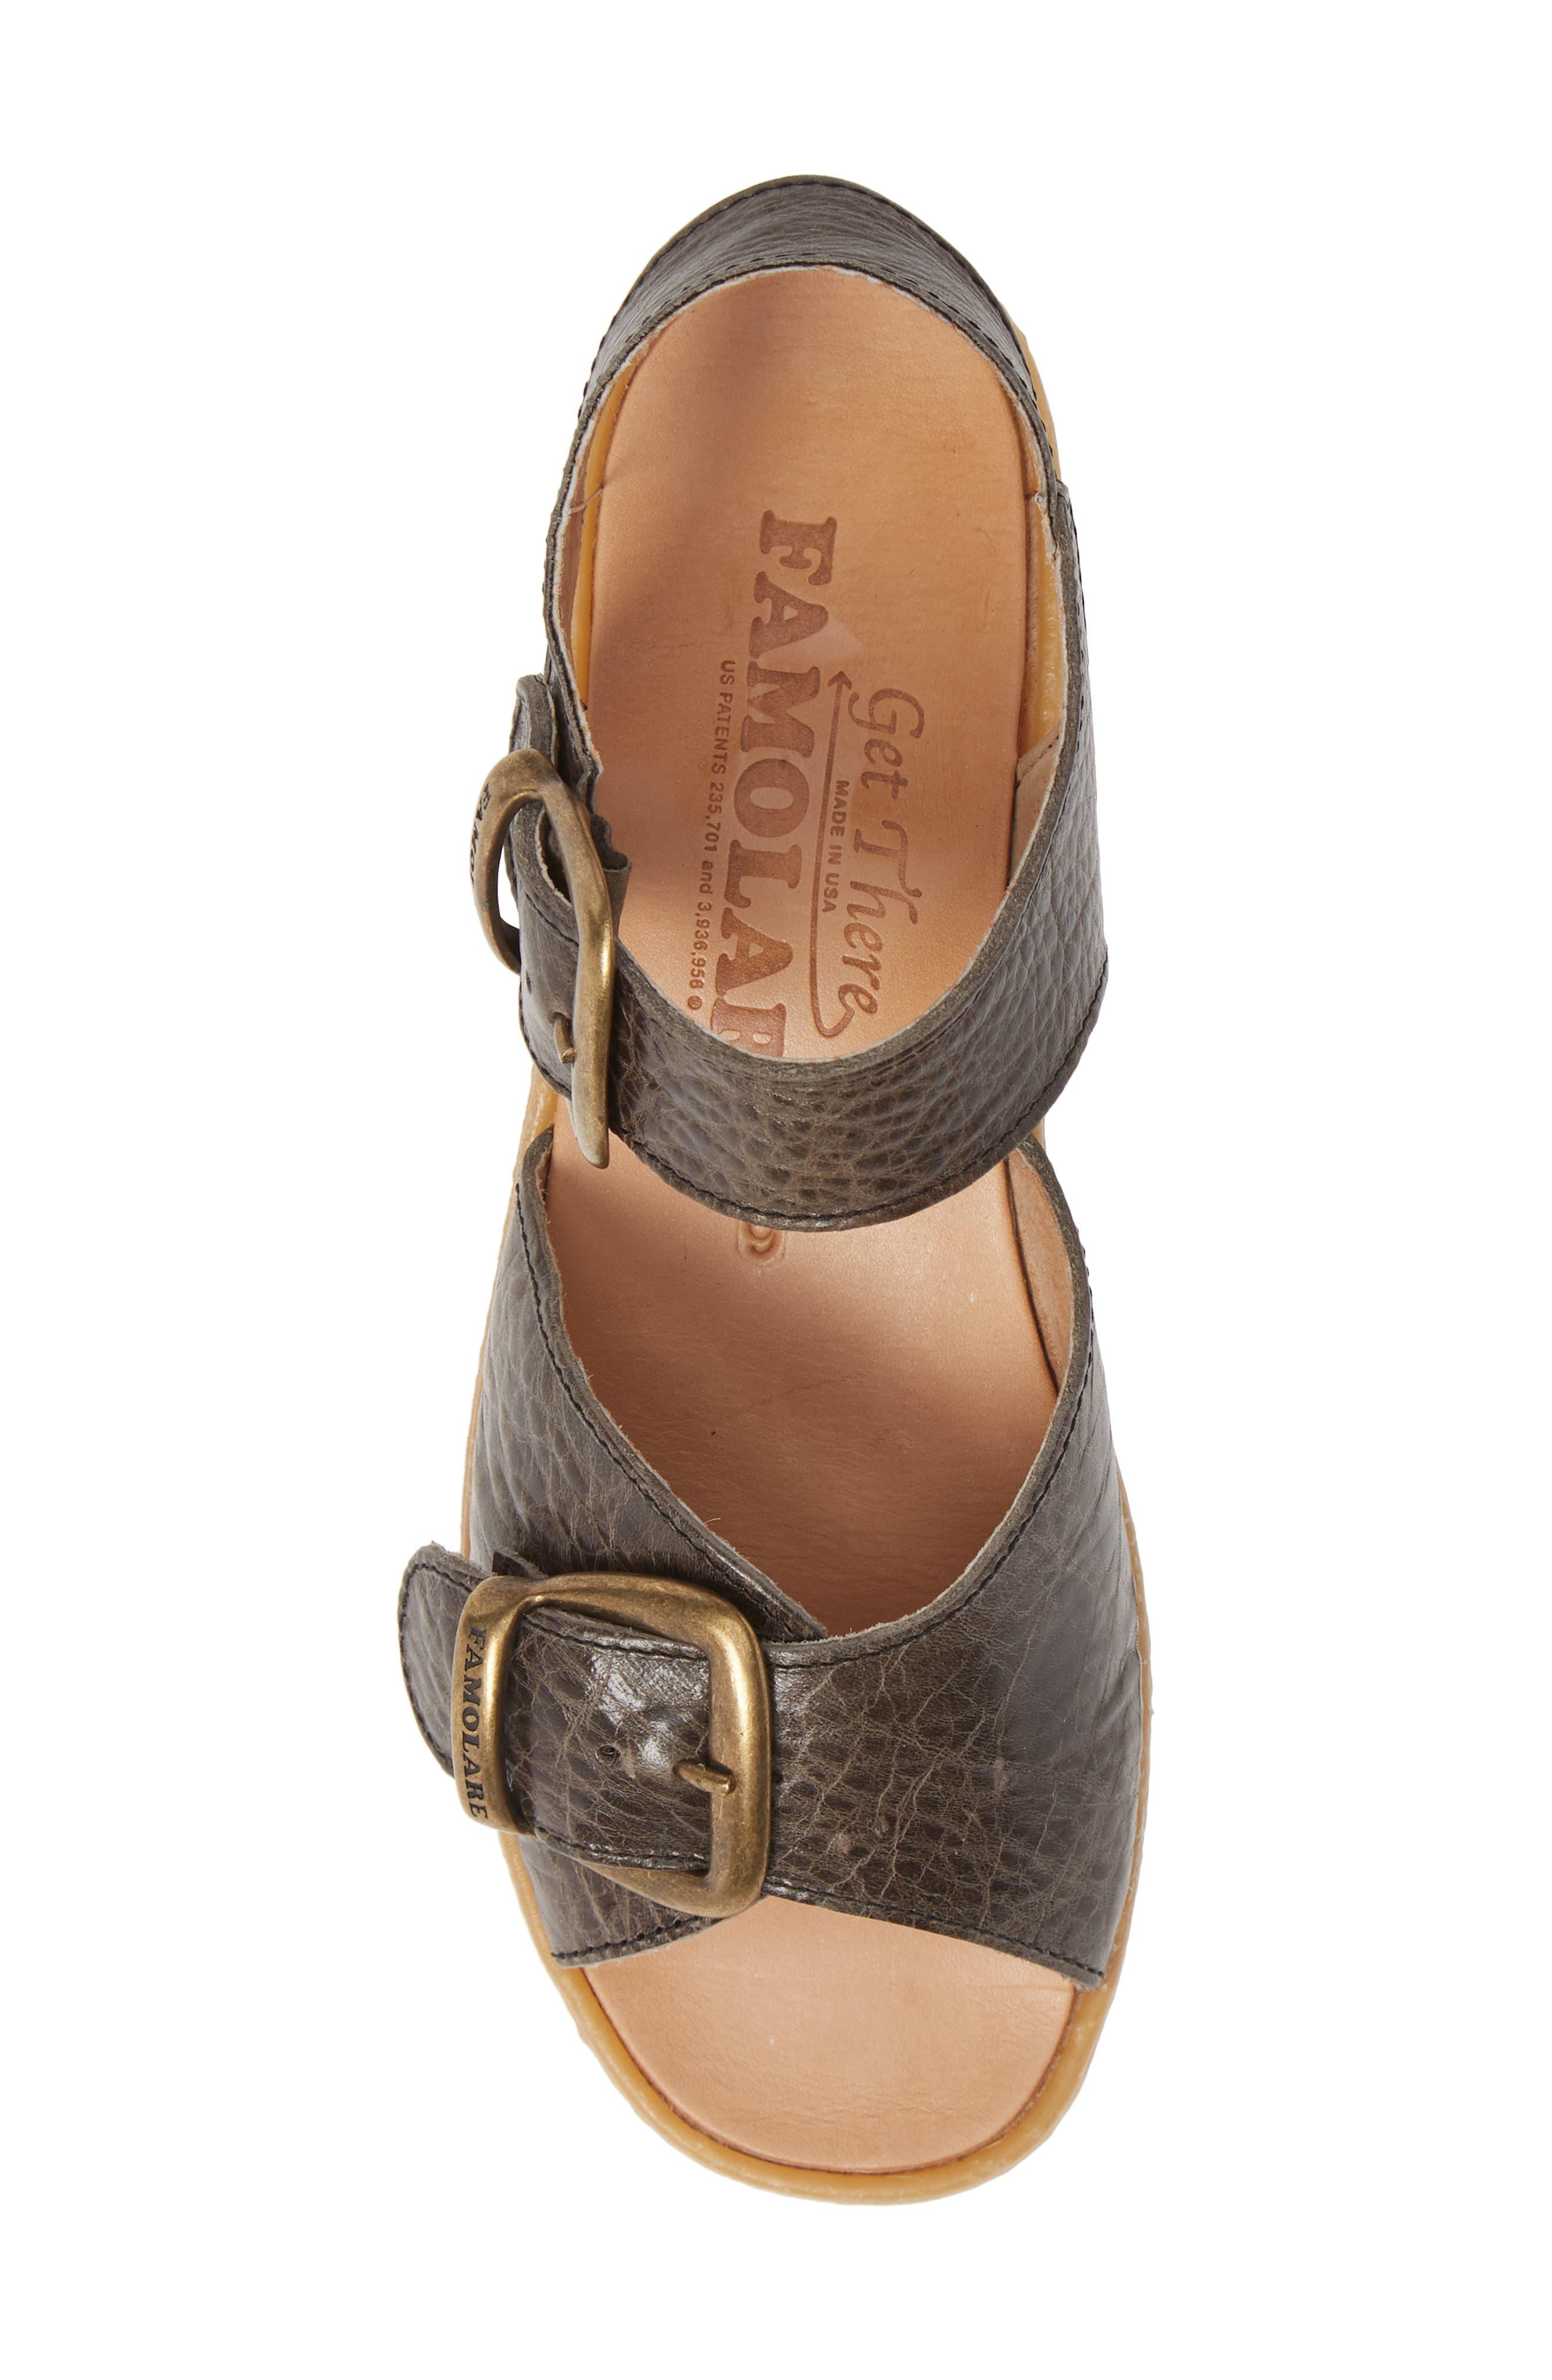 FAMOLARE, Double Play Platform Sandal, Alternate thumbnail 5, color, STEEL SUEDE